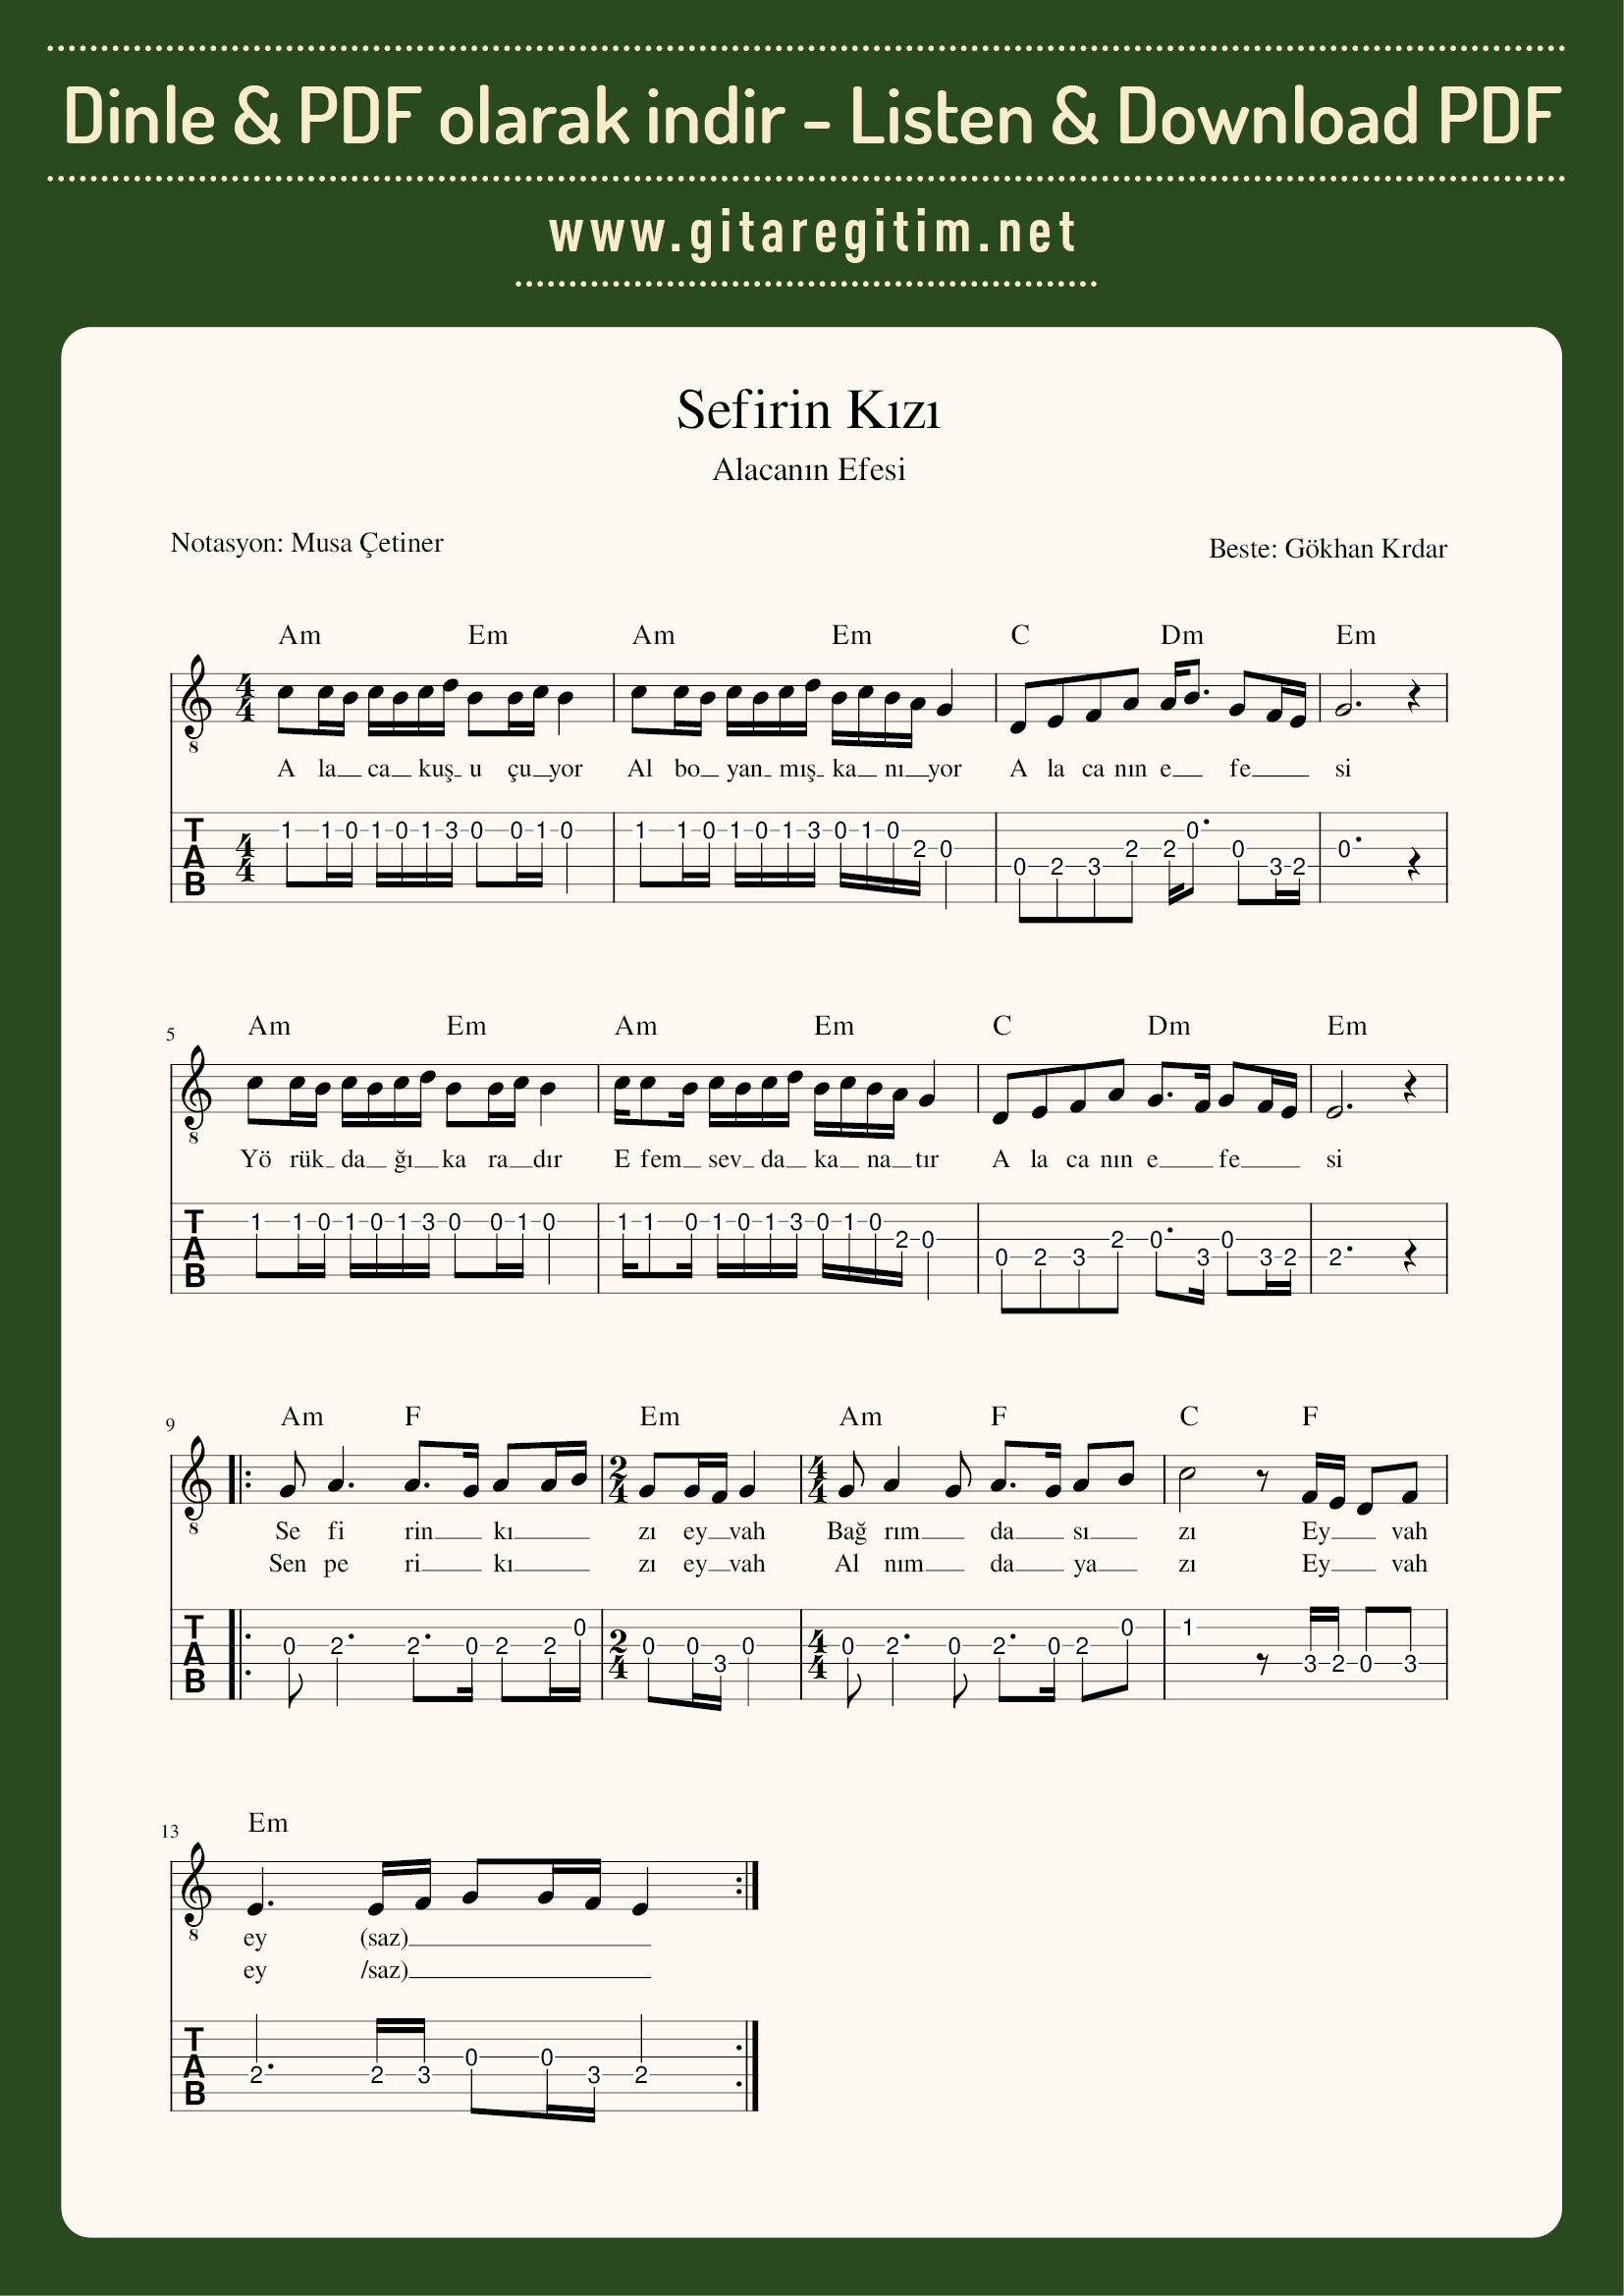 Sefirin Kizi Alacanin Efesi Nota Tab Gitaregitim Net Notalara Dokulmus Muzik Muzik Notalari Muzik